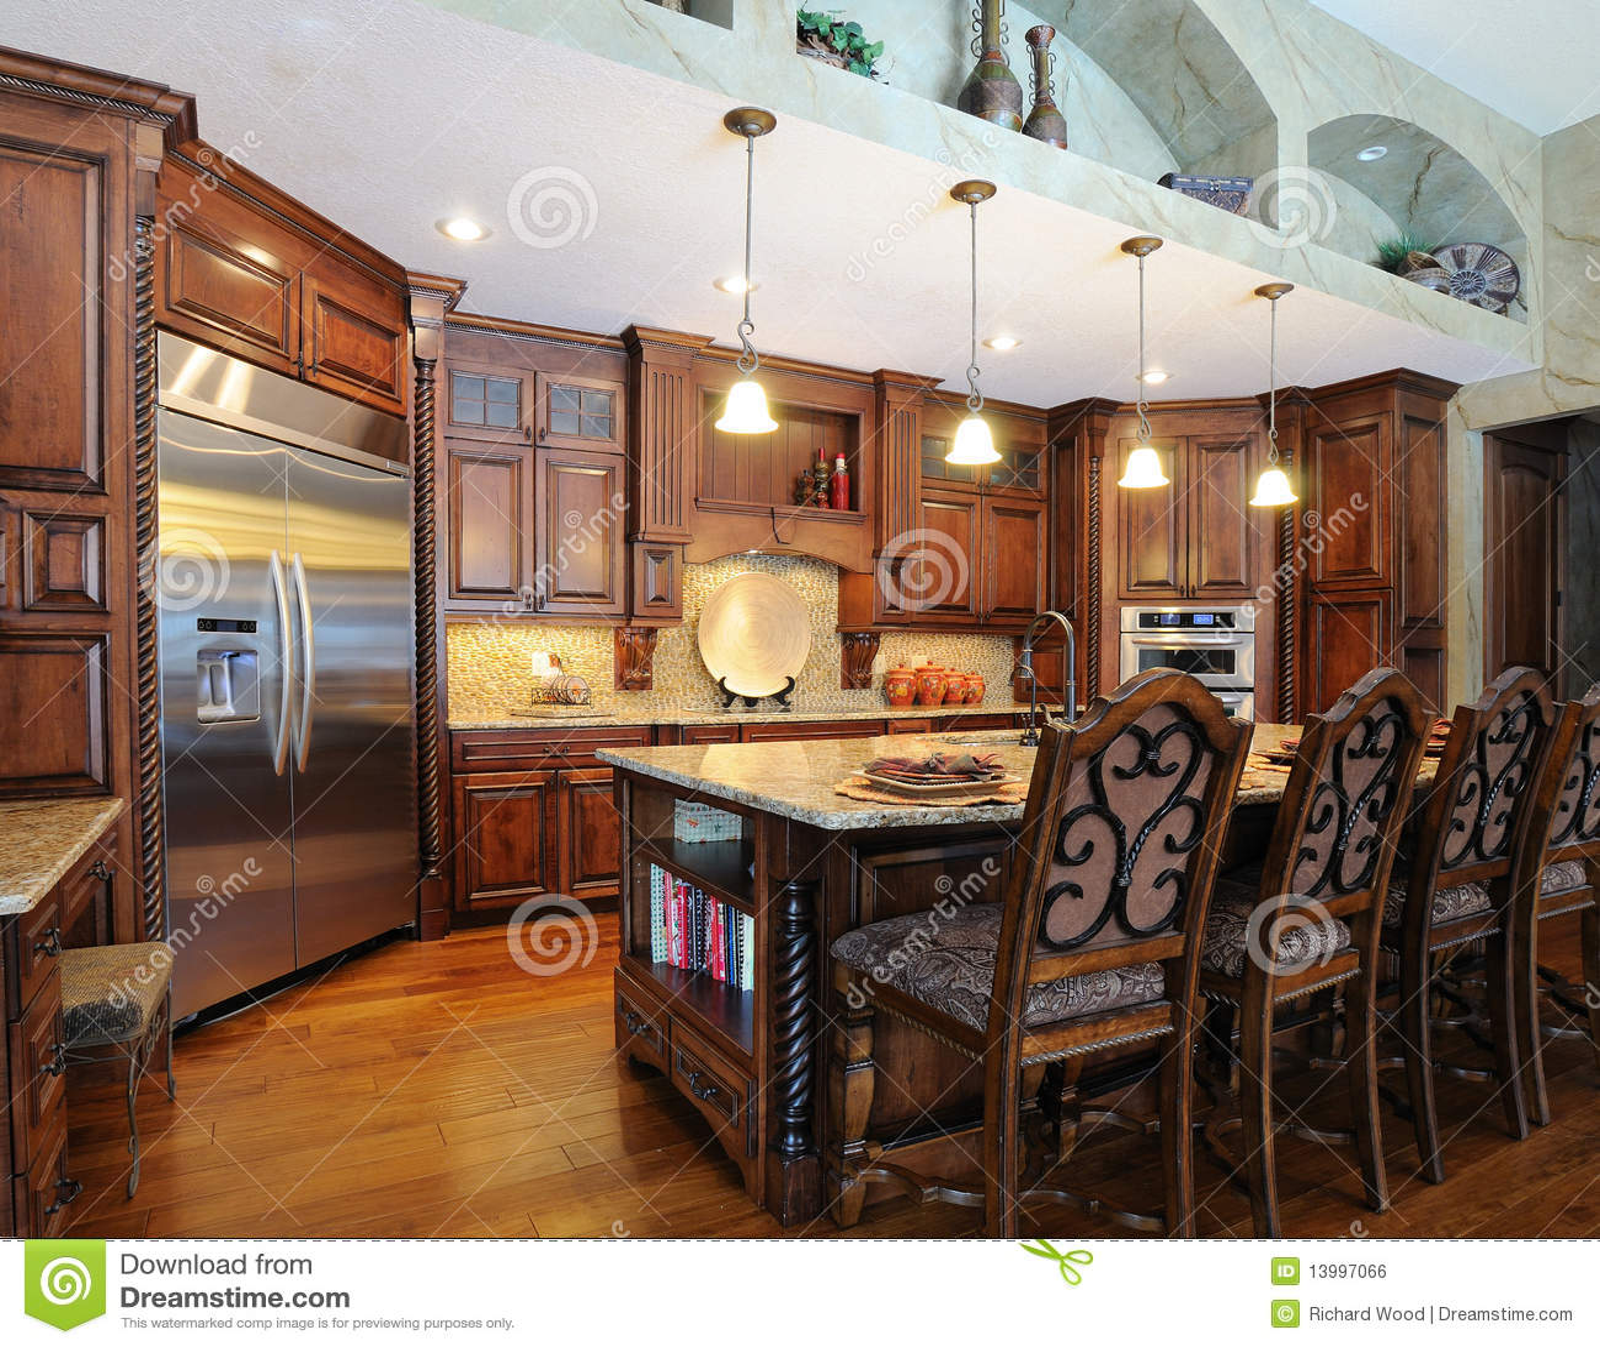 industrial kitchen stools under sink mat 厨房现代高级库存照片 图片包括有机柜 当代 冰箱 browne 樱桃 凳子 厨房现代高级